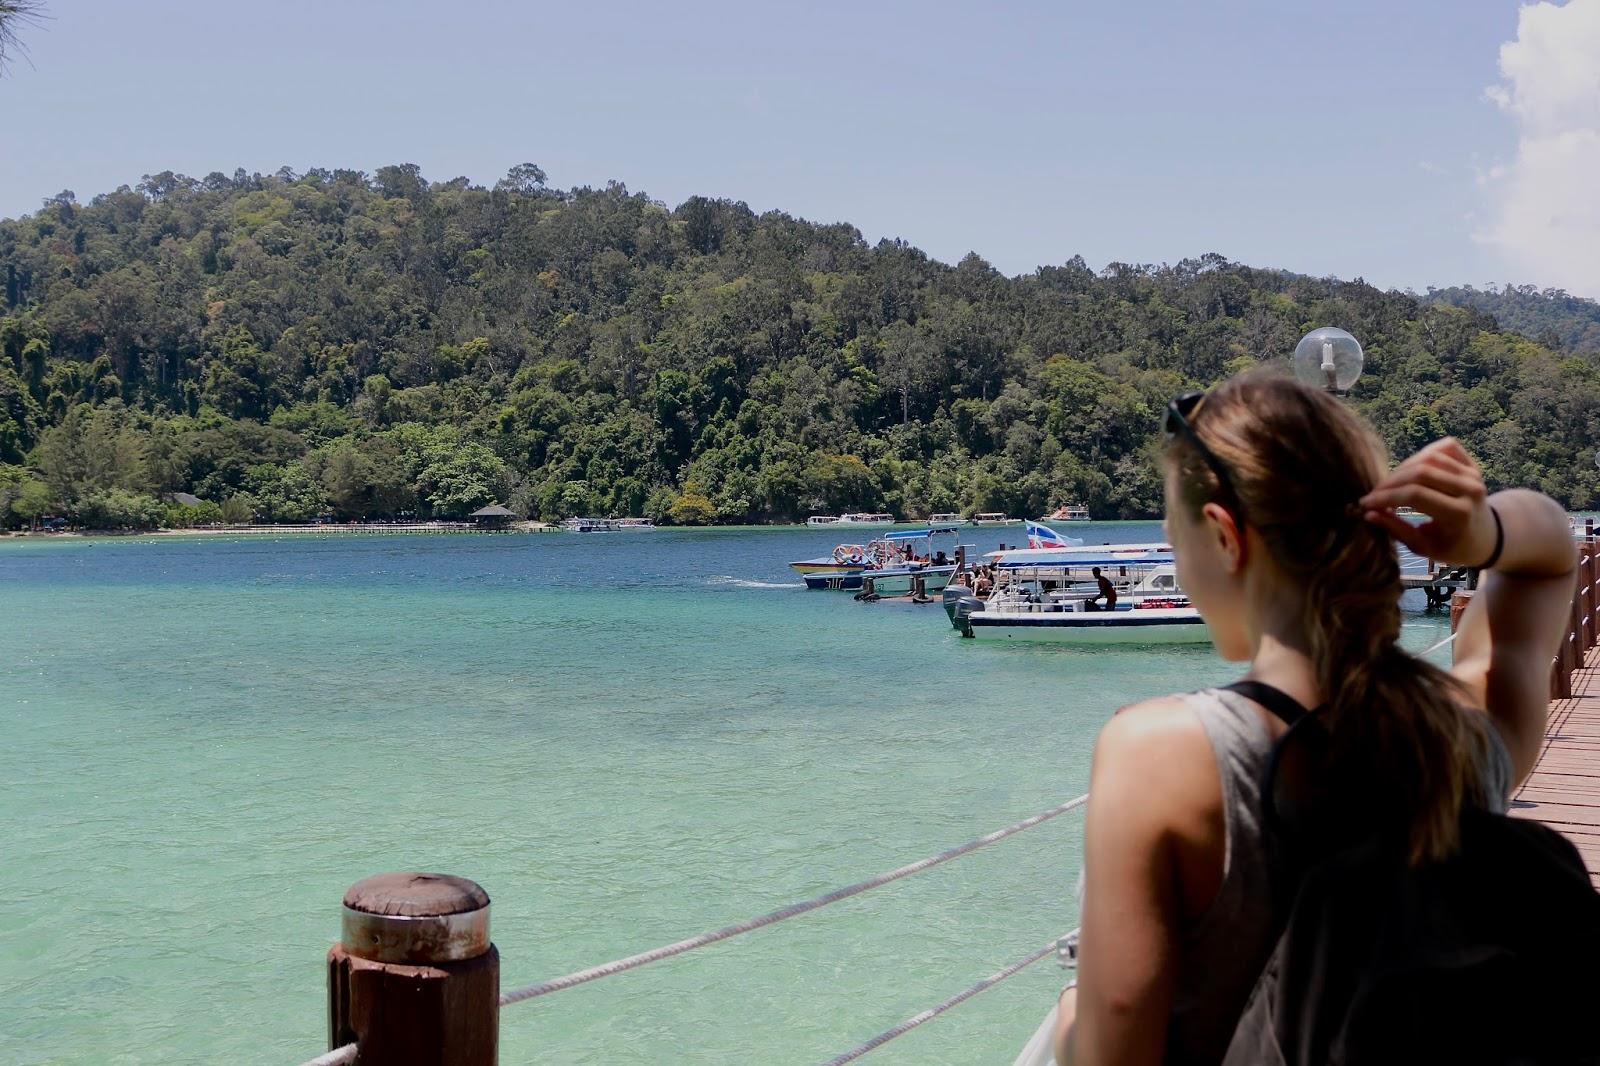 Sapi Island, Kota Kinabalu, Borneo, Malaysia